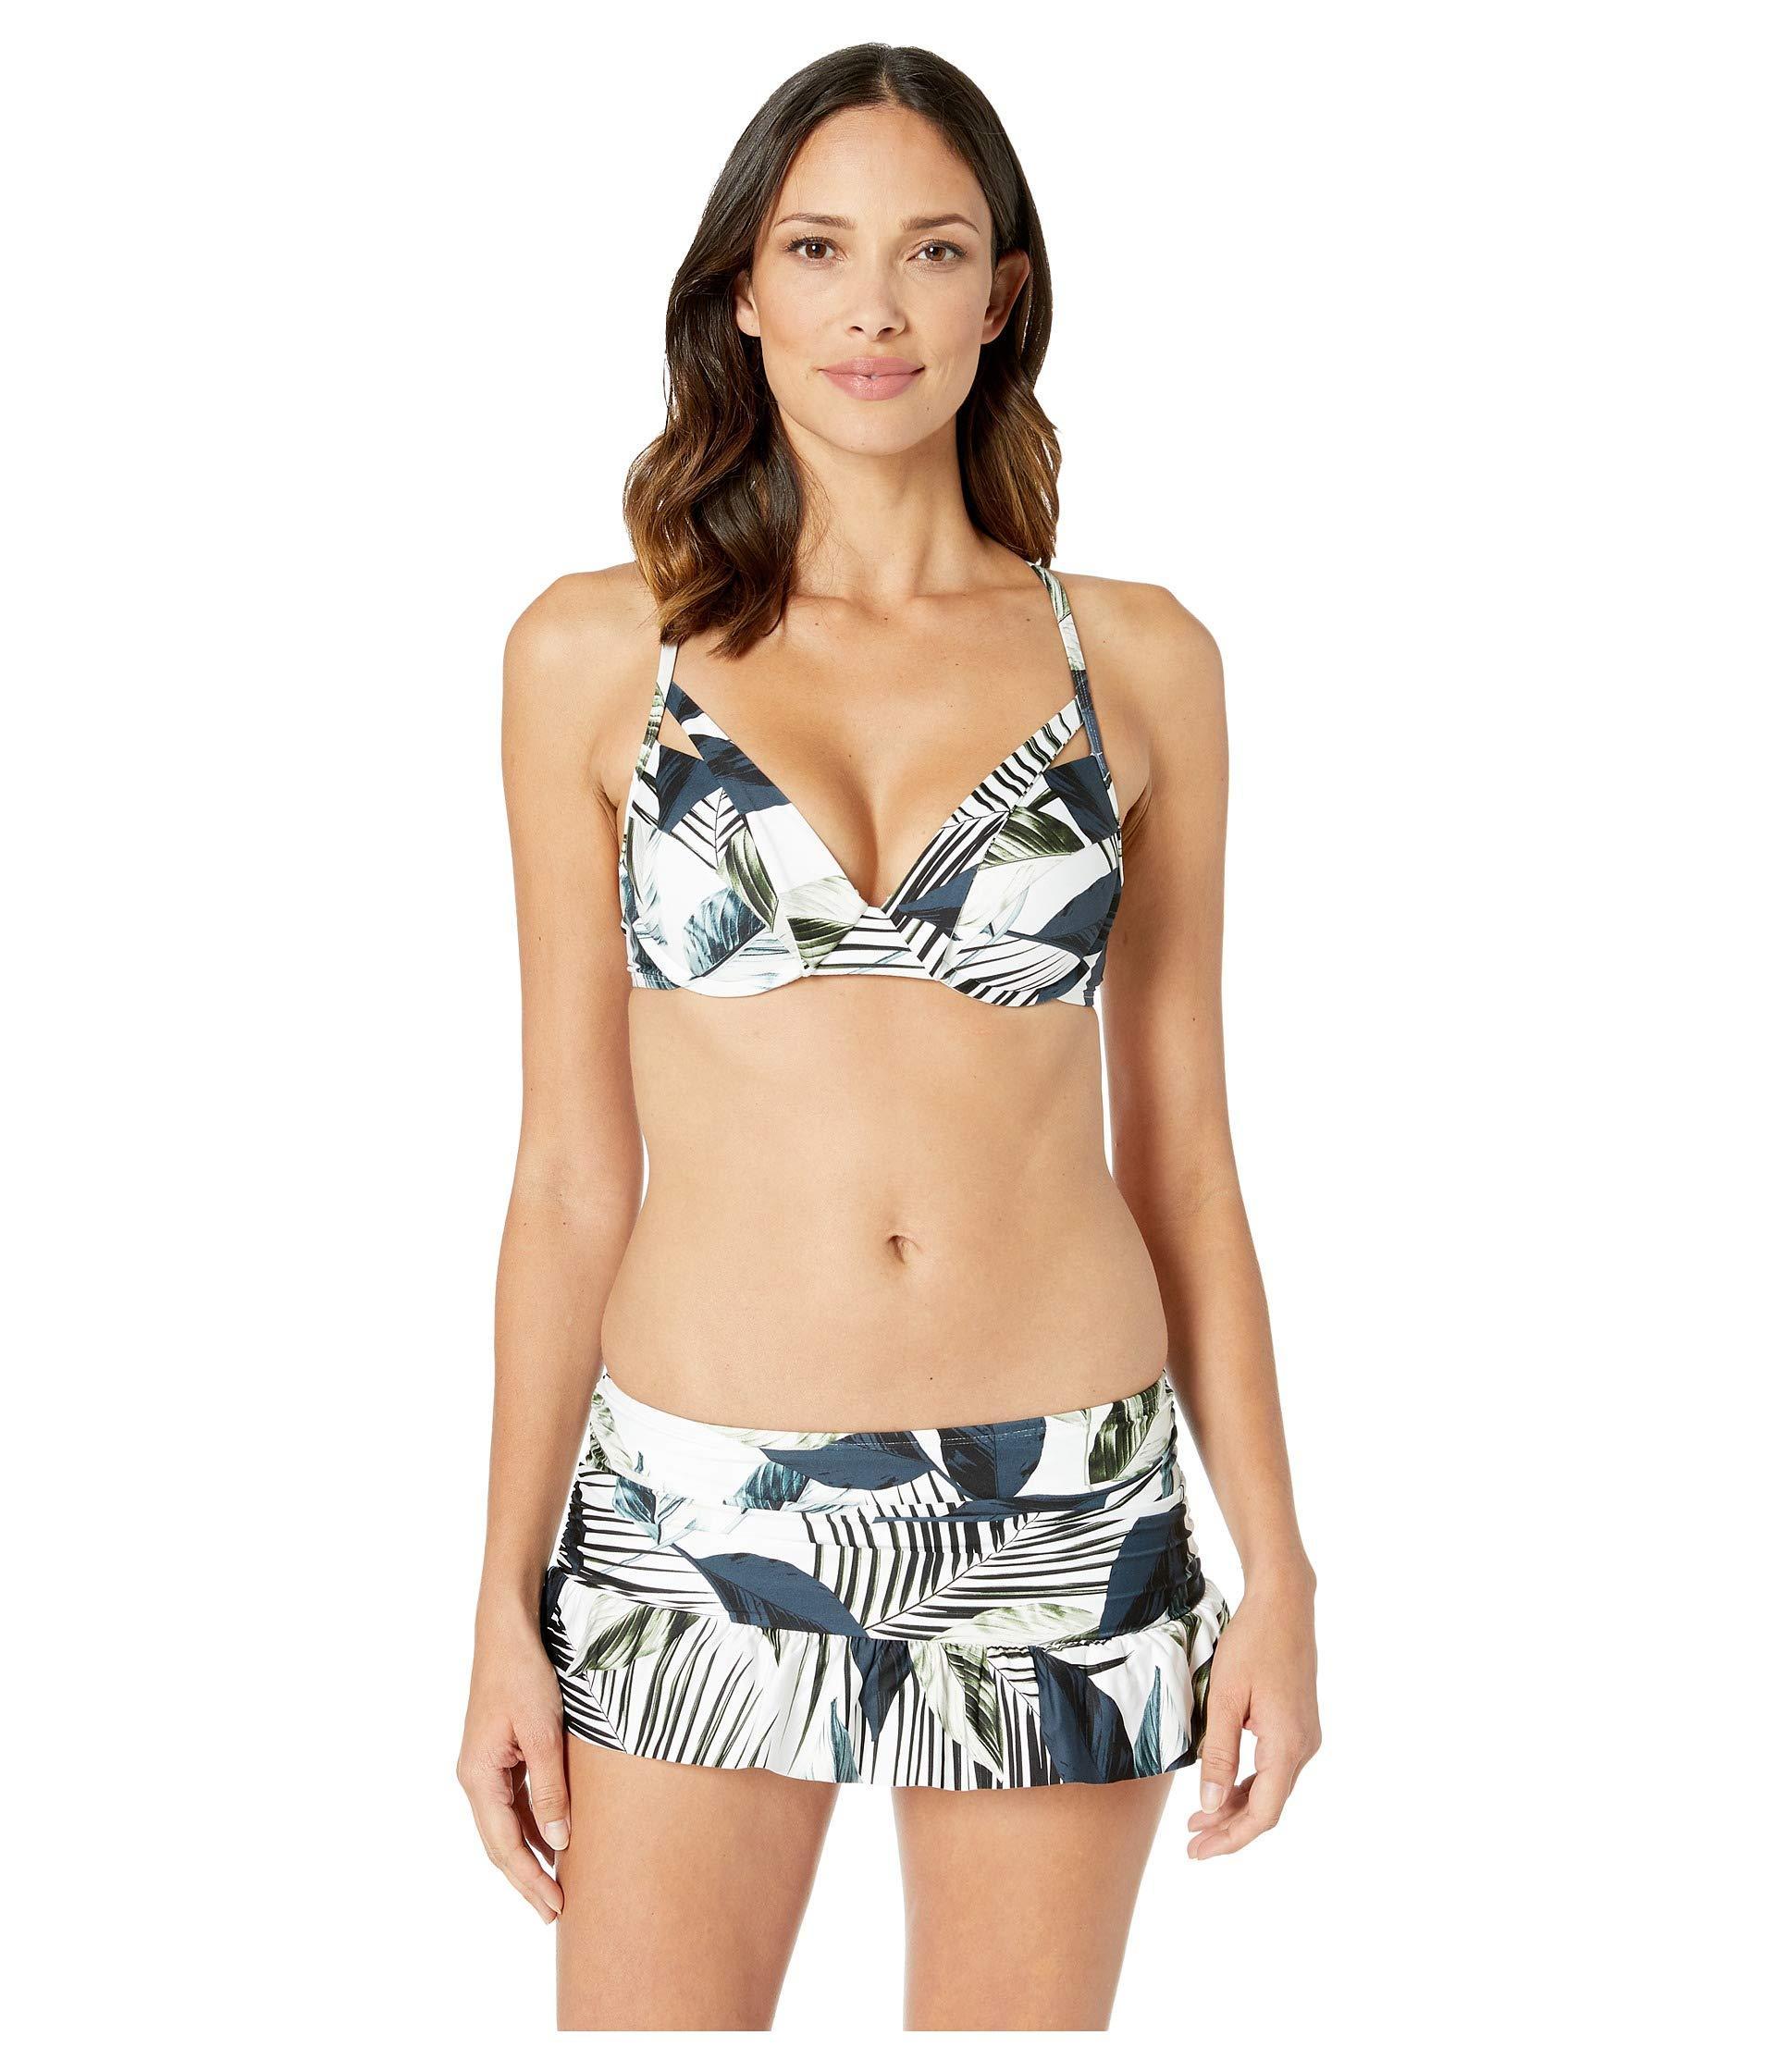 8e586830f4573 La Blanca - Moment Of Zen Underwire Push-up Top (blue) Women s Swimwear.  View fullscreen